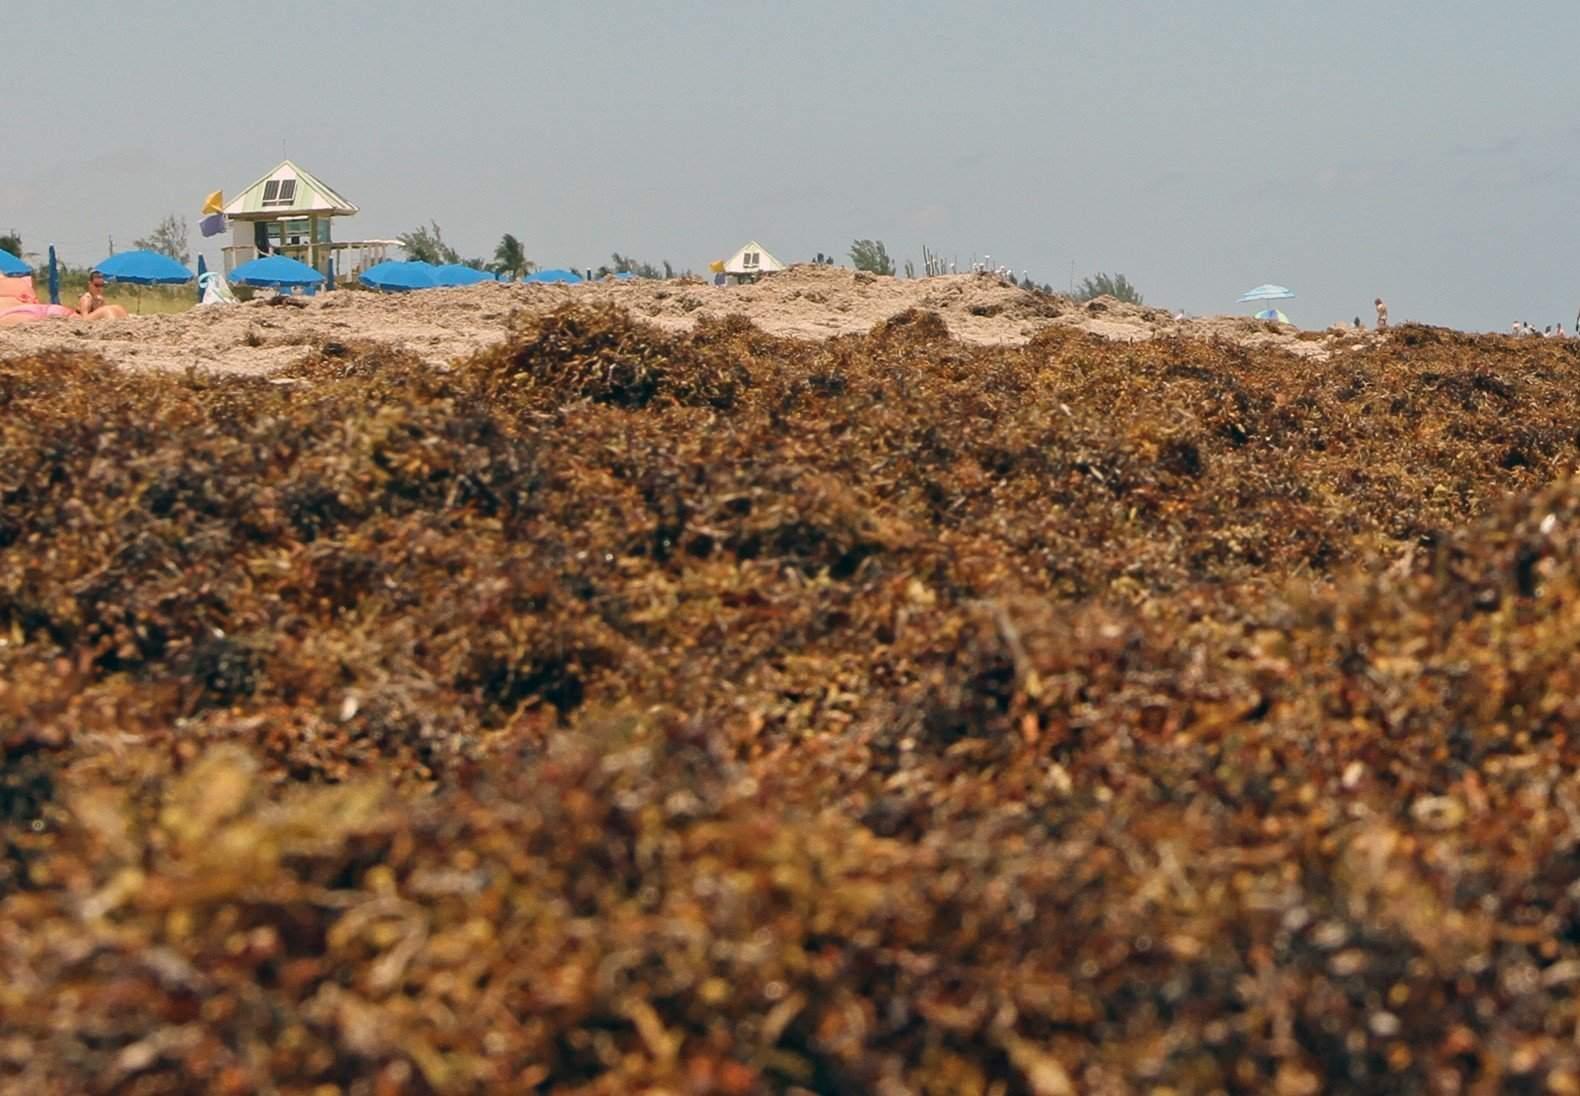 Sargassum seaweed now piling up on Florida beaches becoming